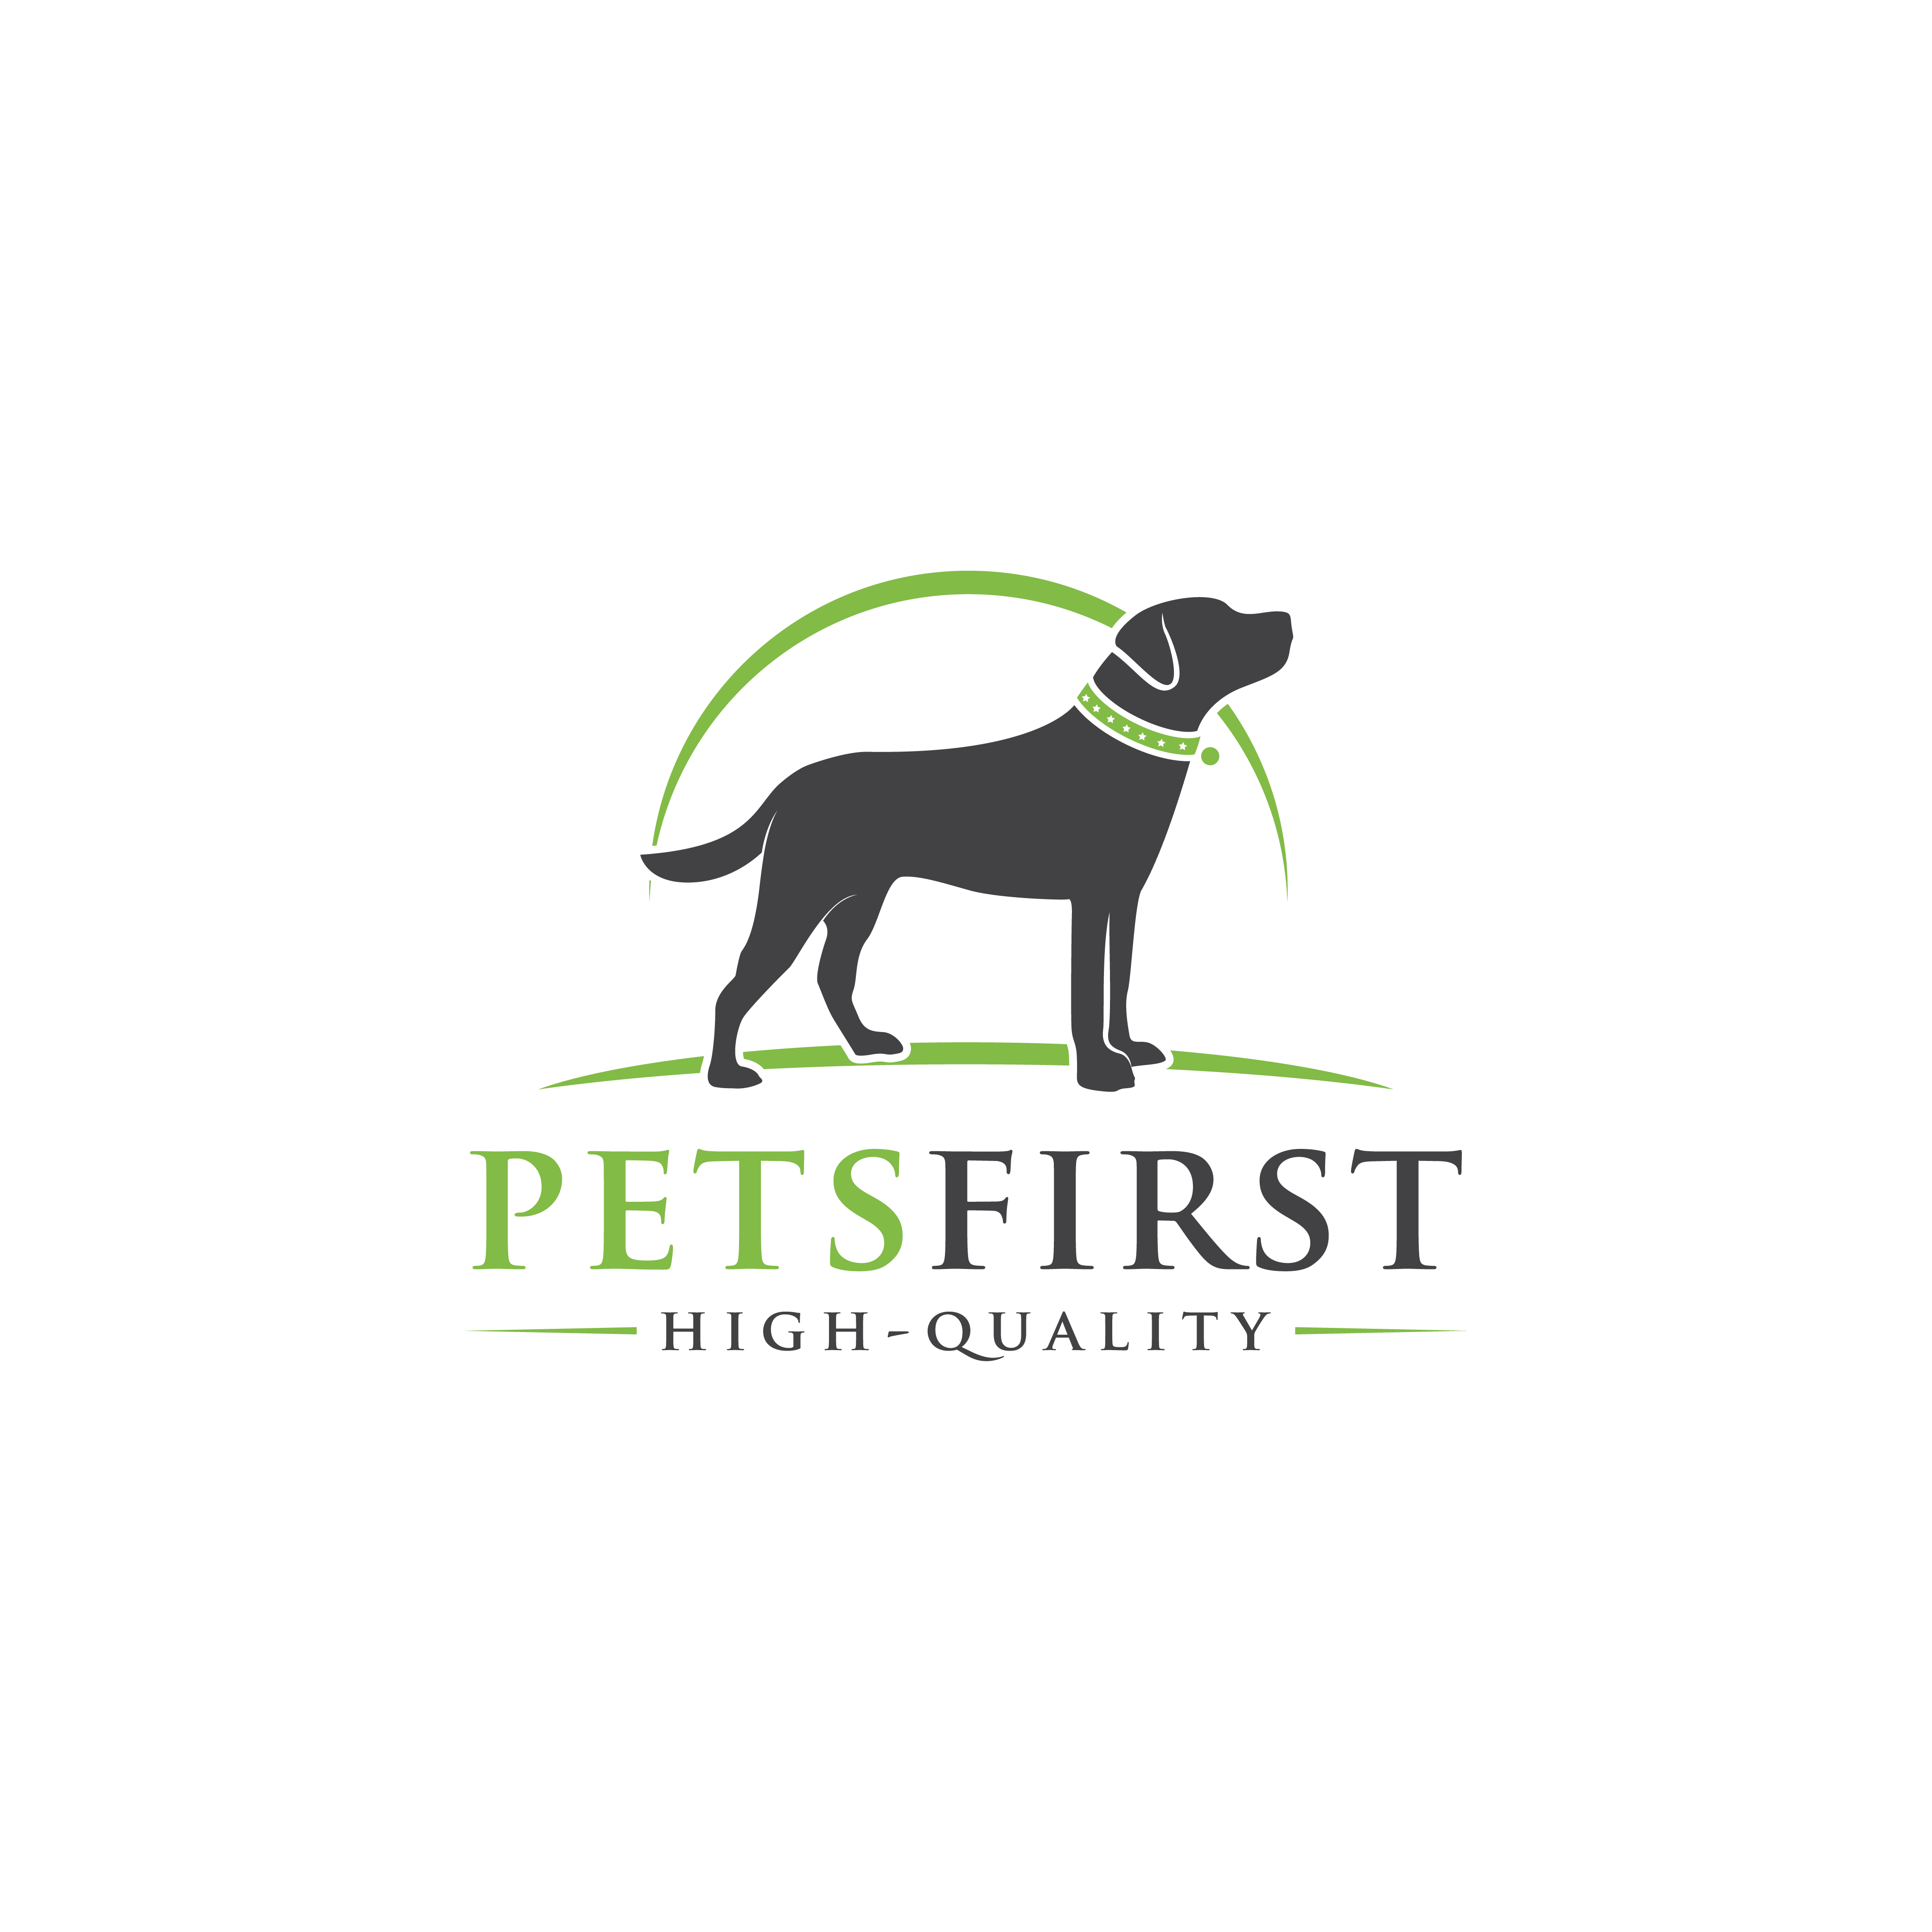 Petsfirst-RGBiPKDYQhlFSbue